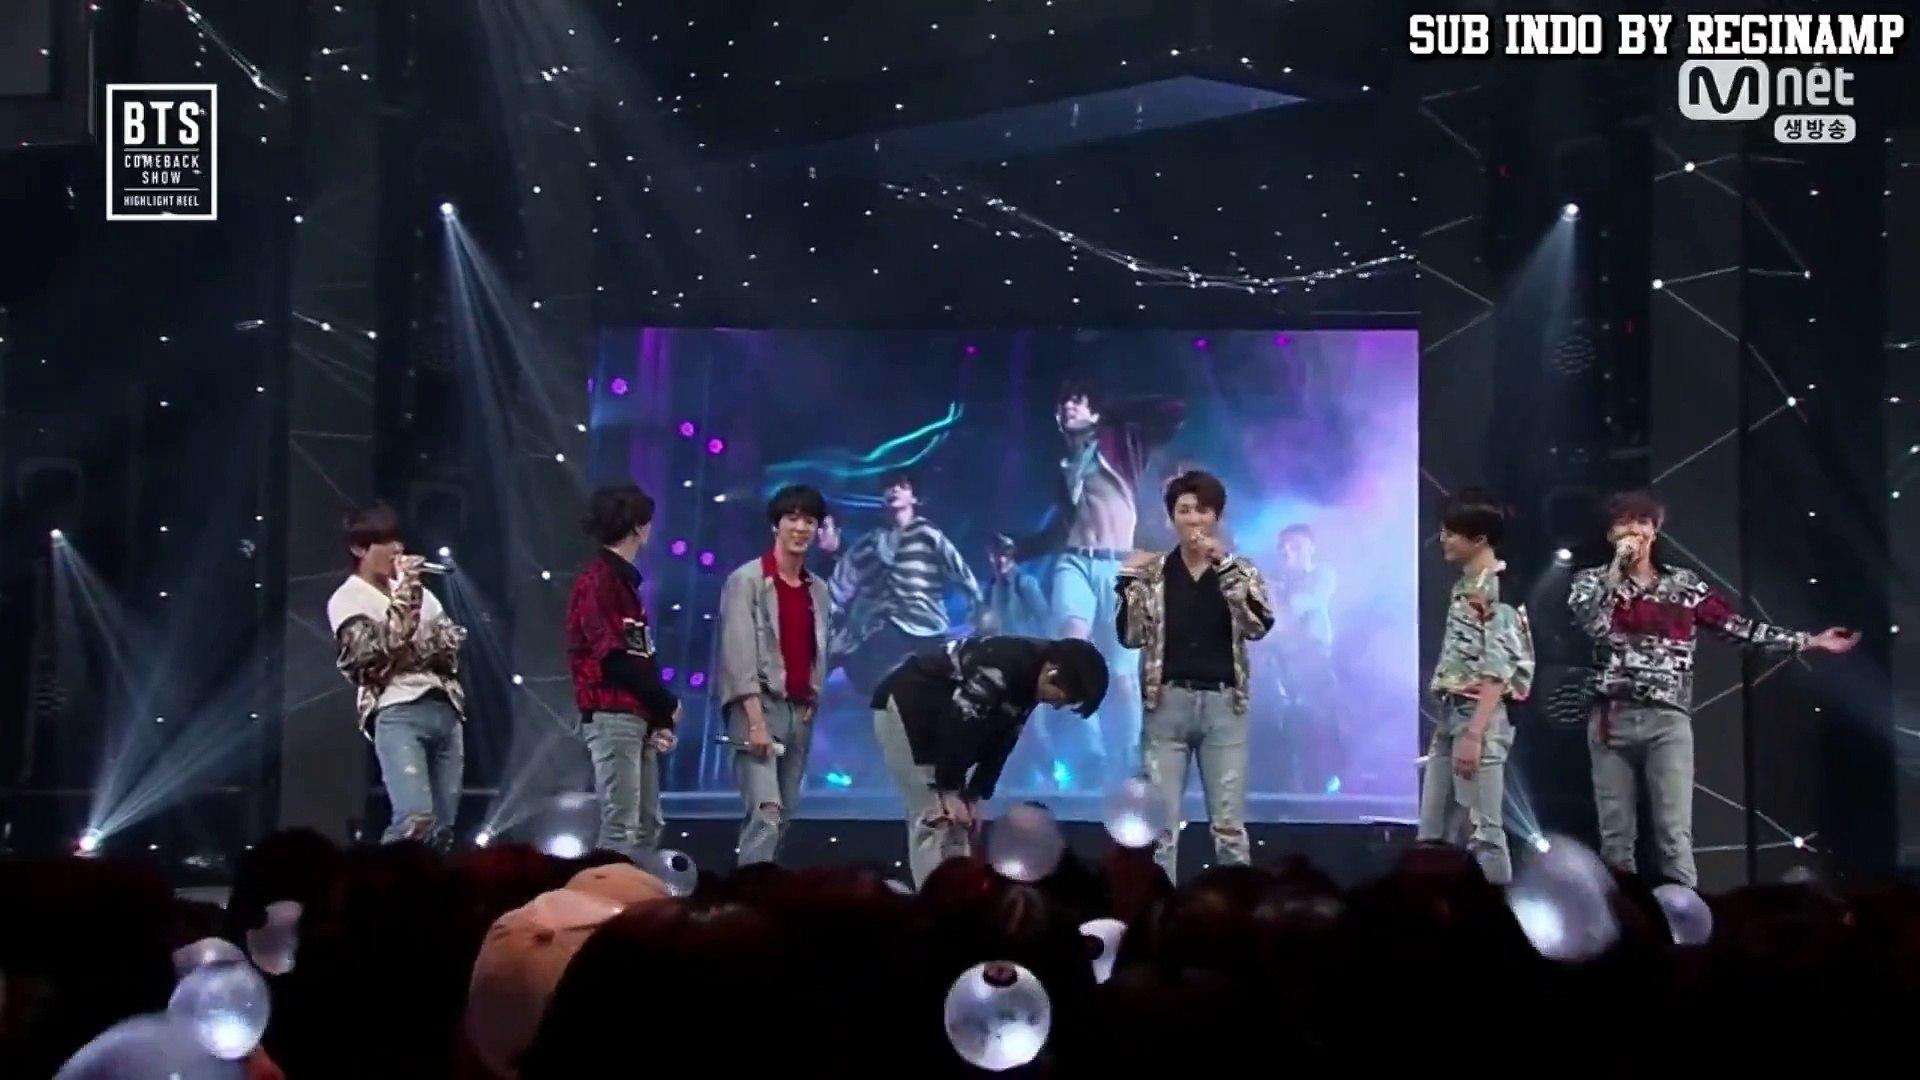 [INDO SUB] BTS Comeback Show Highliht Reel - Opening